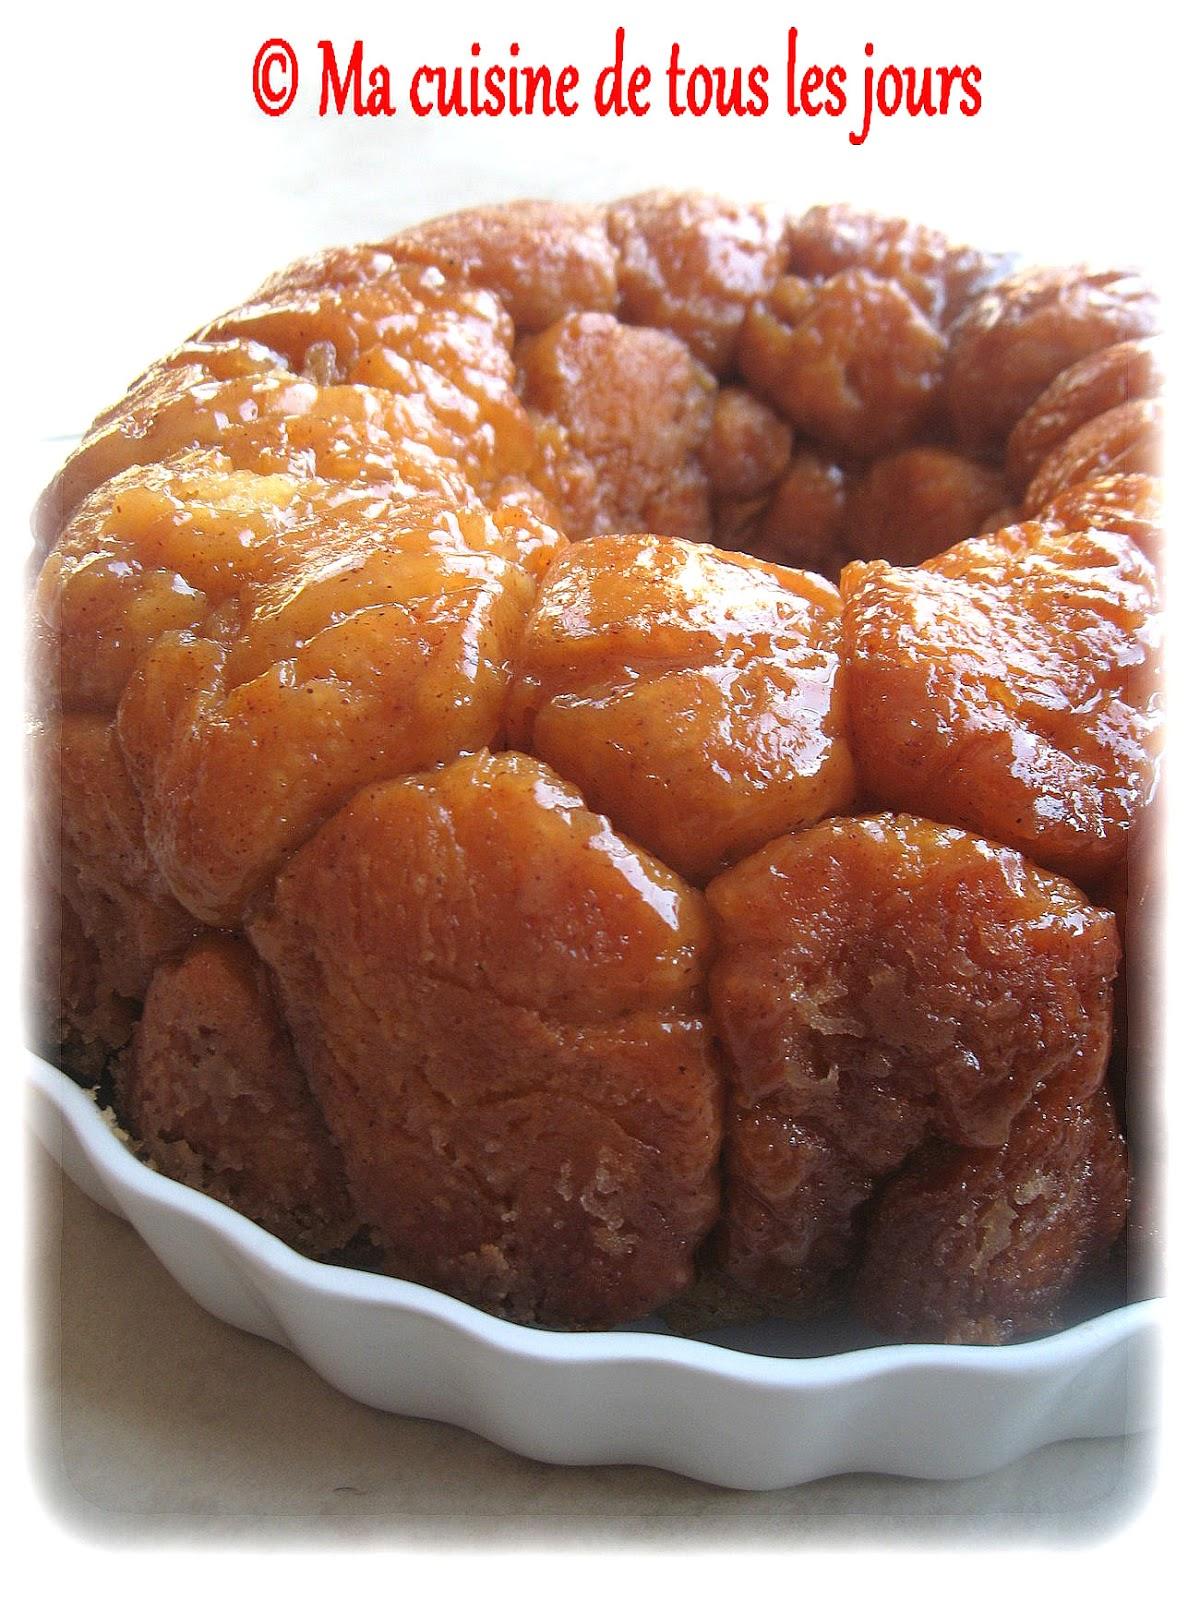 Monkey bread (brioché au caramel) - Recette